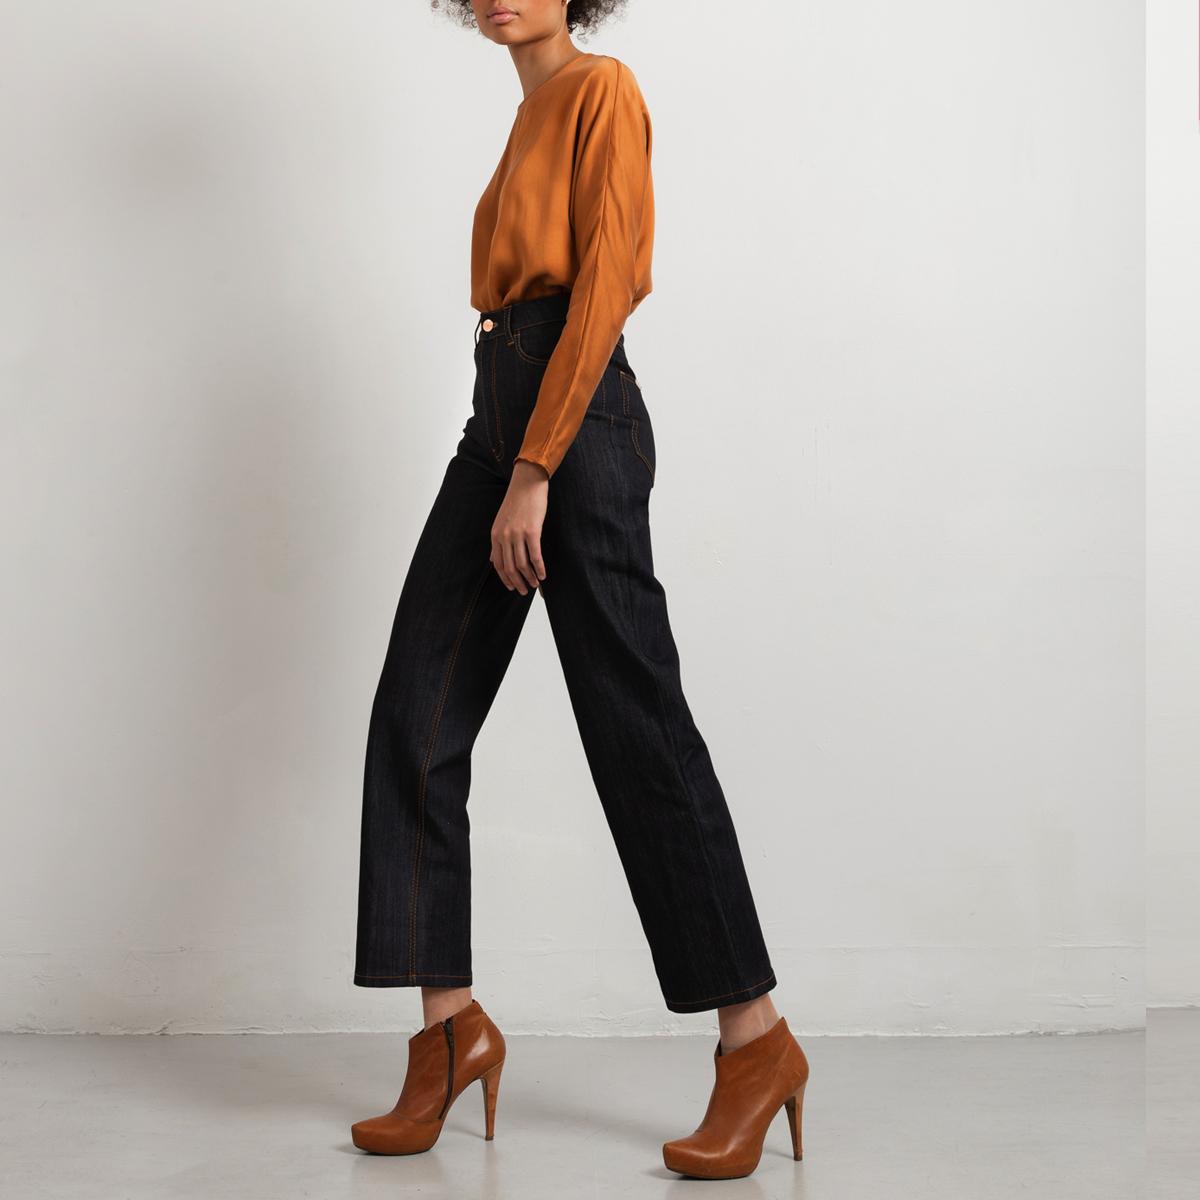 Blue wide leg jeans